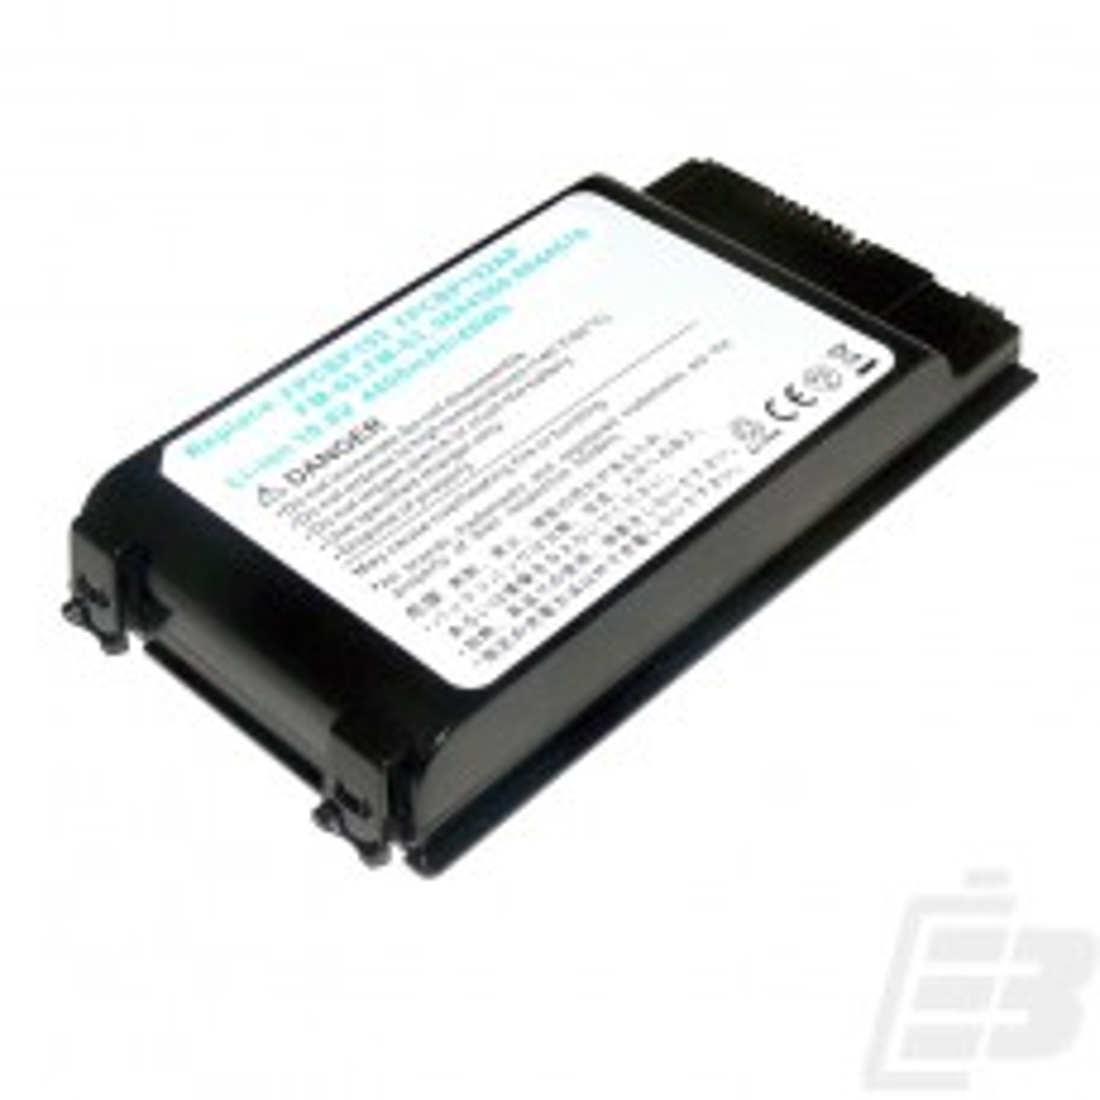 Laptop battery Fujitsu Lifebook V1130_1